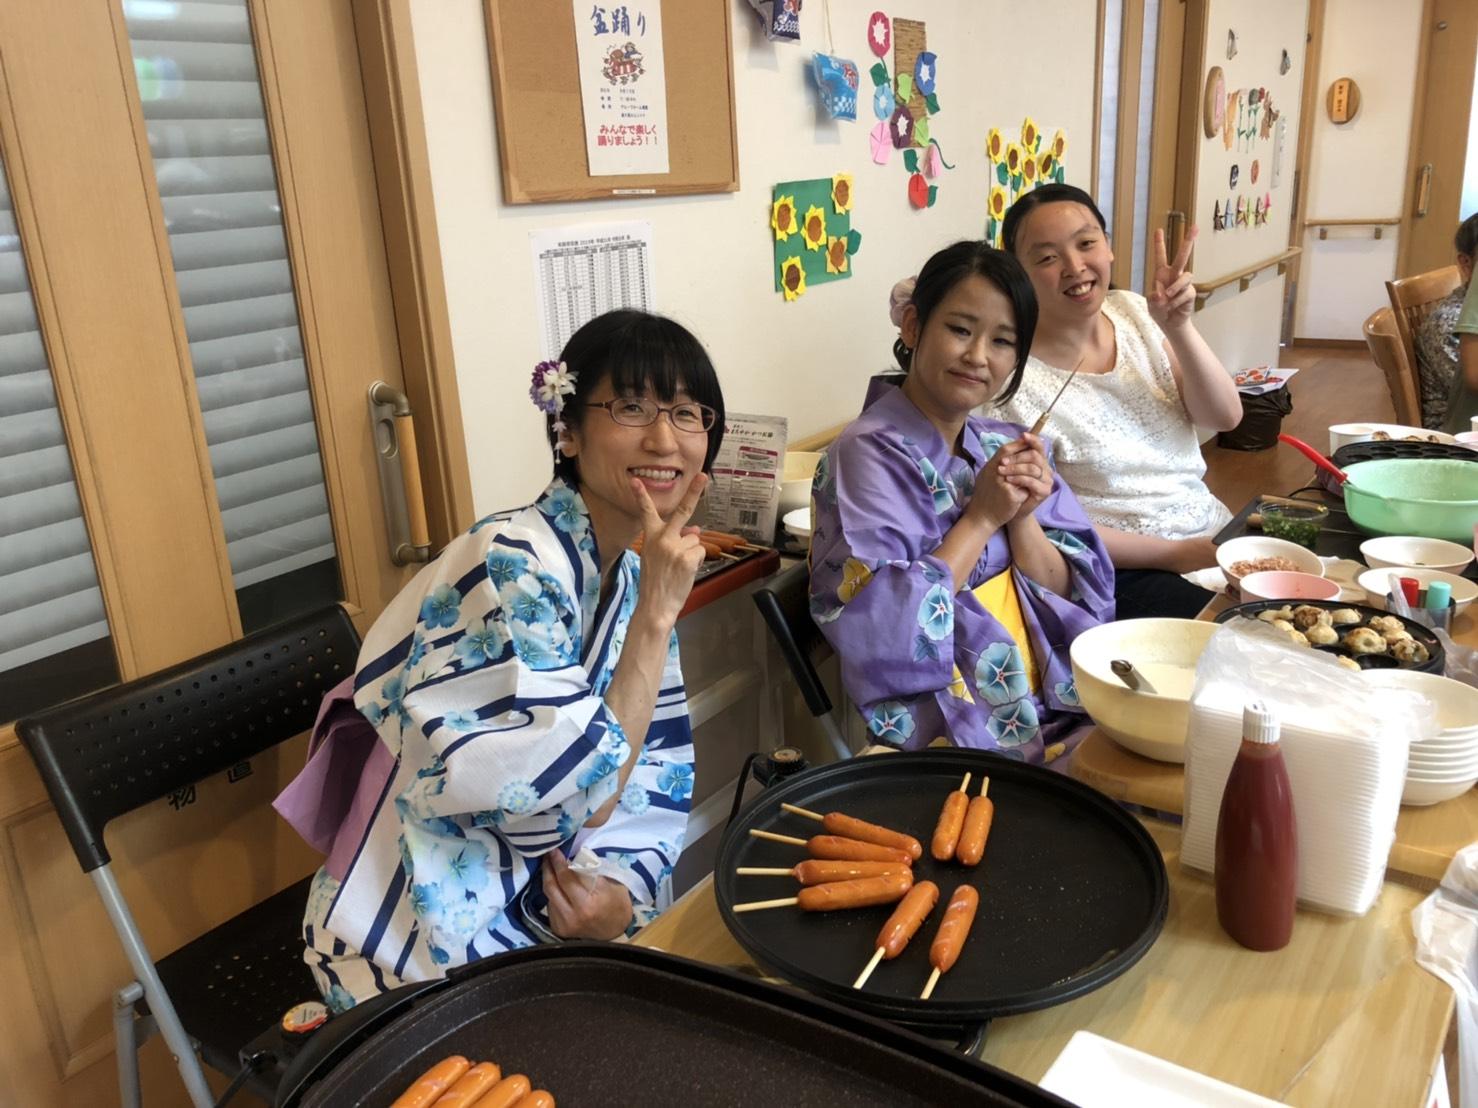 2019年8月10日 楽々苑夏祭り